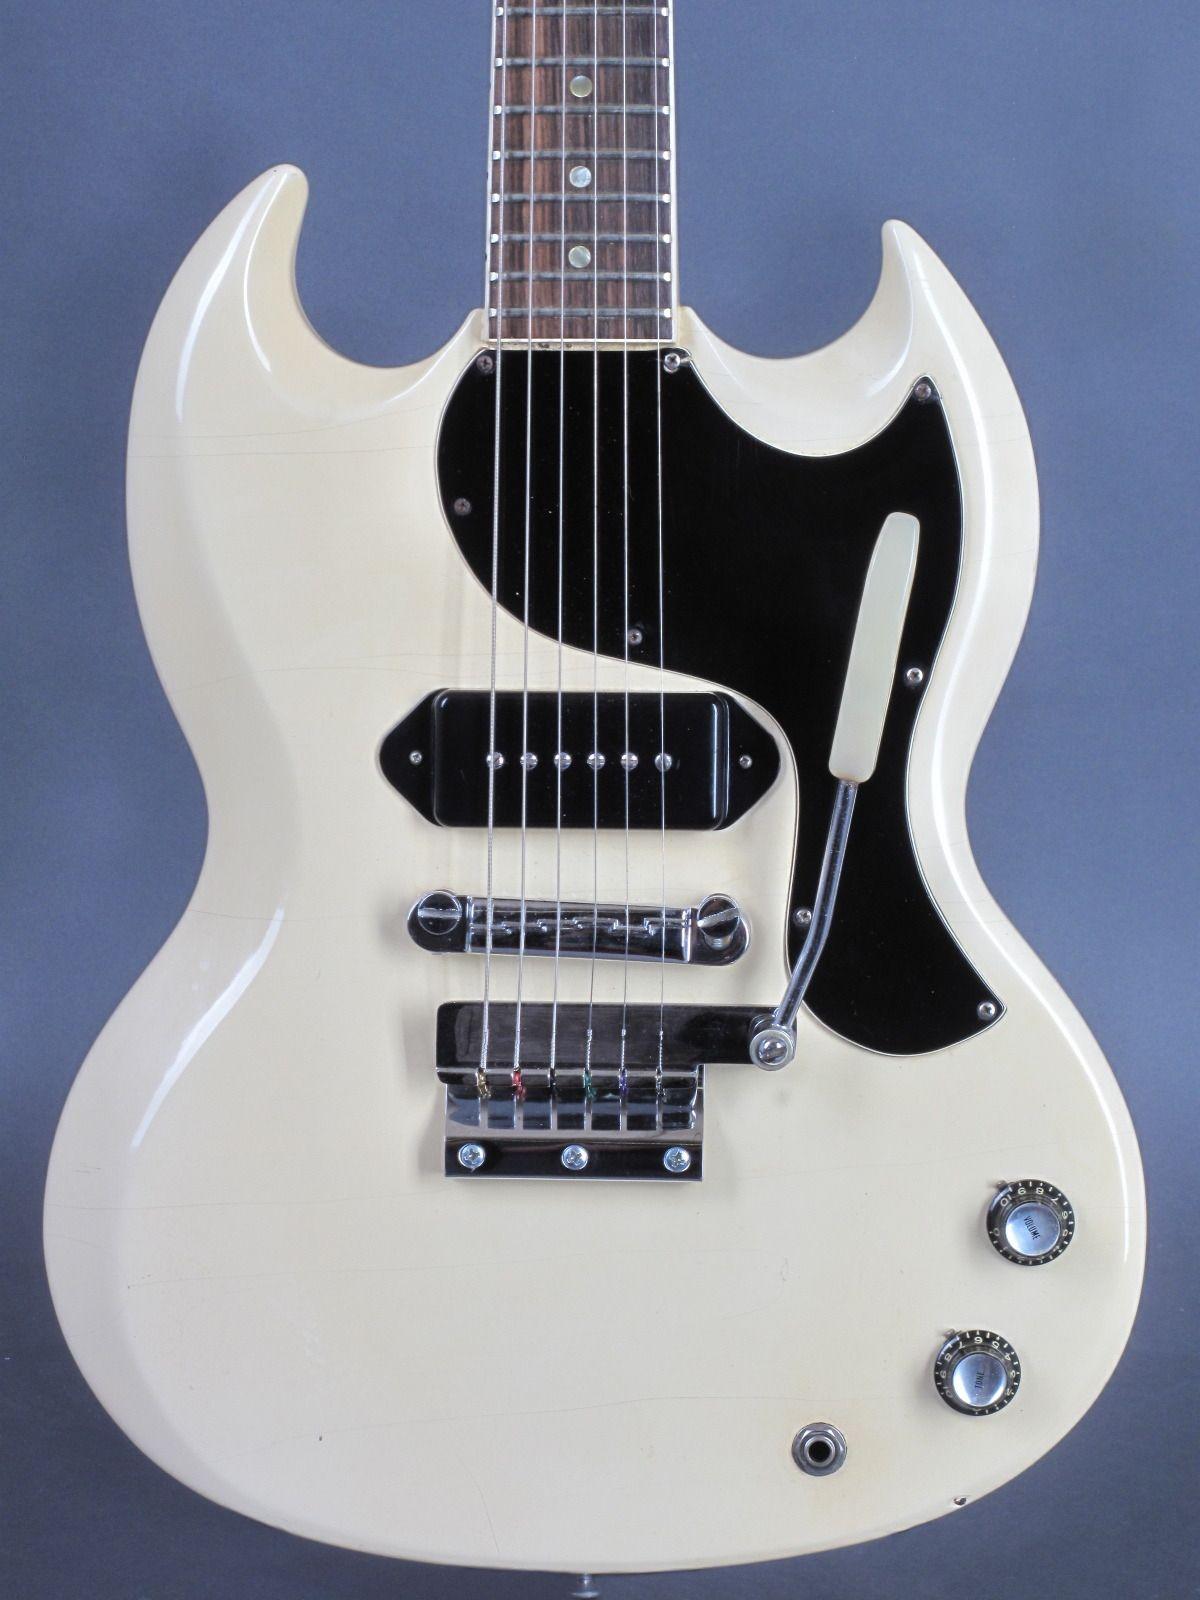 1965 Gibson SG Junior Gibson Sg Junior, Pick Up, Guitars, Vintage Guitars